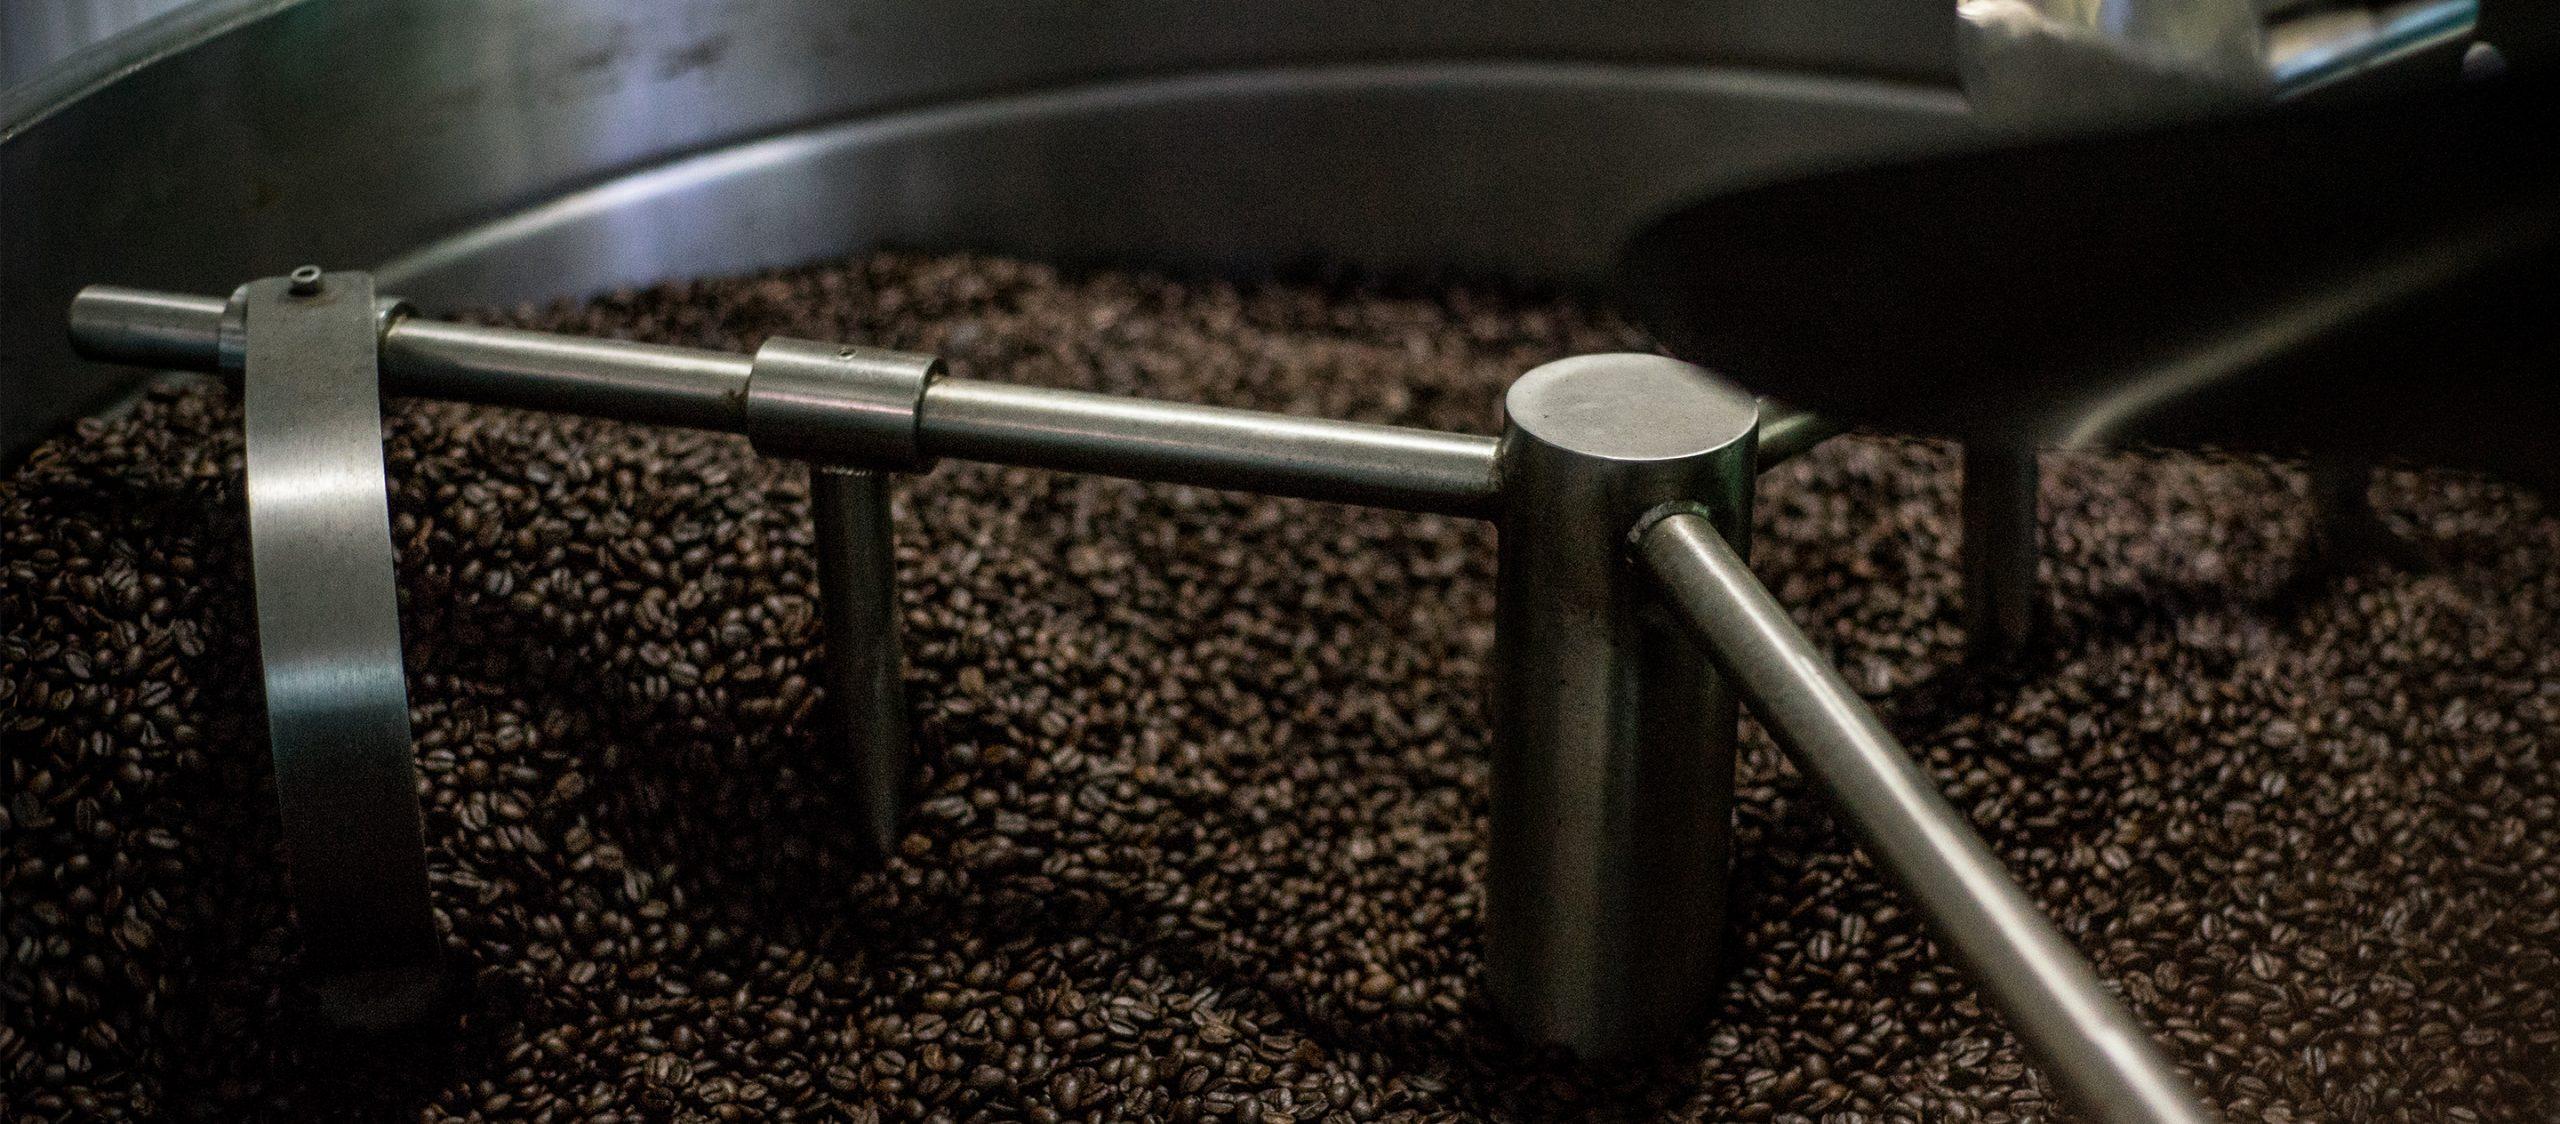 Single Origin Store แบรนด์กาแฟจากเชียงใหม่ที่ฝันอยากเห็นเมล็ดกาแฟไทยได้เติบโต